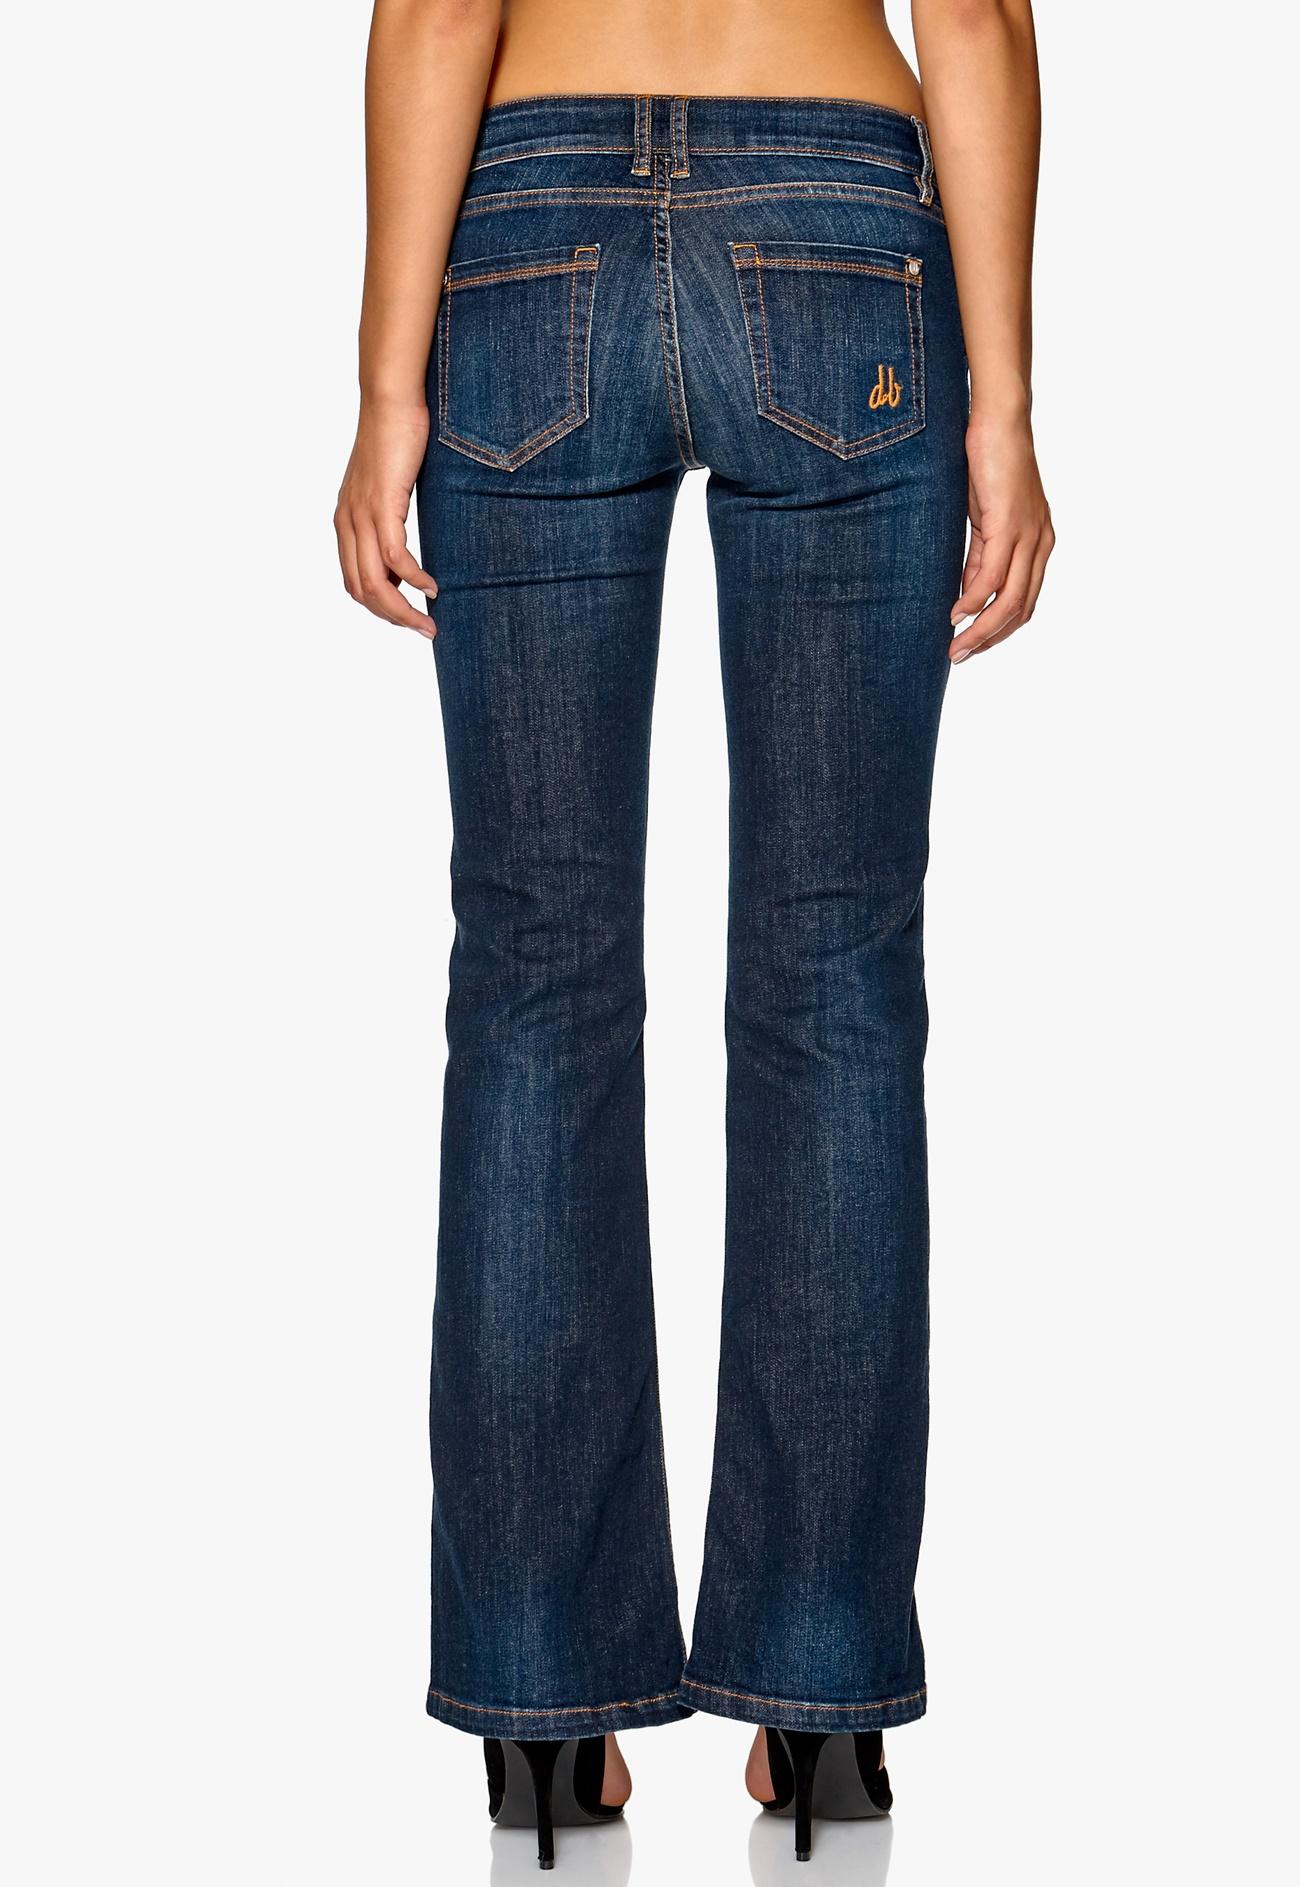 Complete List of Denim Jeans Brands – Denim Jeans Brands 15 Fifteen Denims 18th Amendment Jeans jeans Phillip Lim 3sixteen Denim 3×1 Jeans 5PREVIEW Denim Jeans Brands 15 Fifteen Denims 18th Amendment Jeans jeans Phillip Lim 3sixteen Denim 3×1 Jeans 5PREVIEW Jeans 7 For All Mankind A GOLD E Jeans A.L.C. Jeans A.N.D.